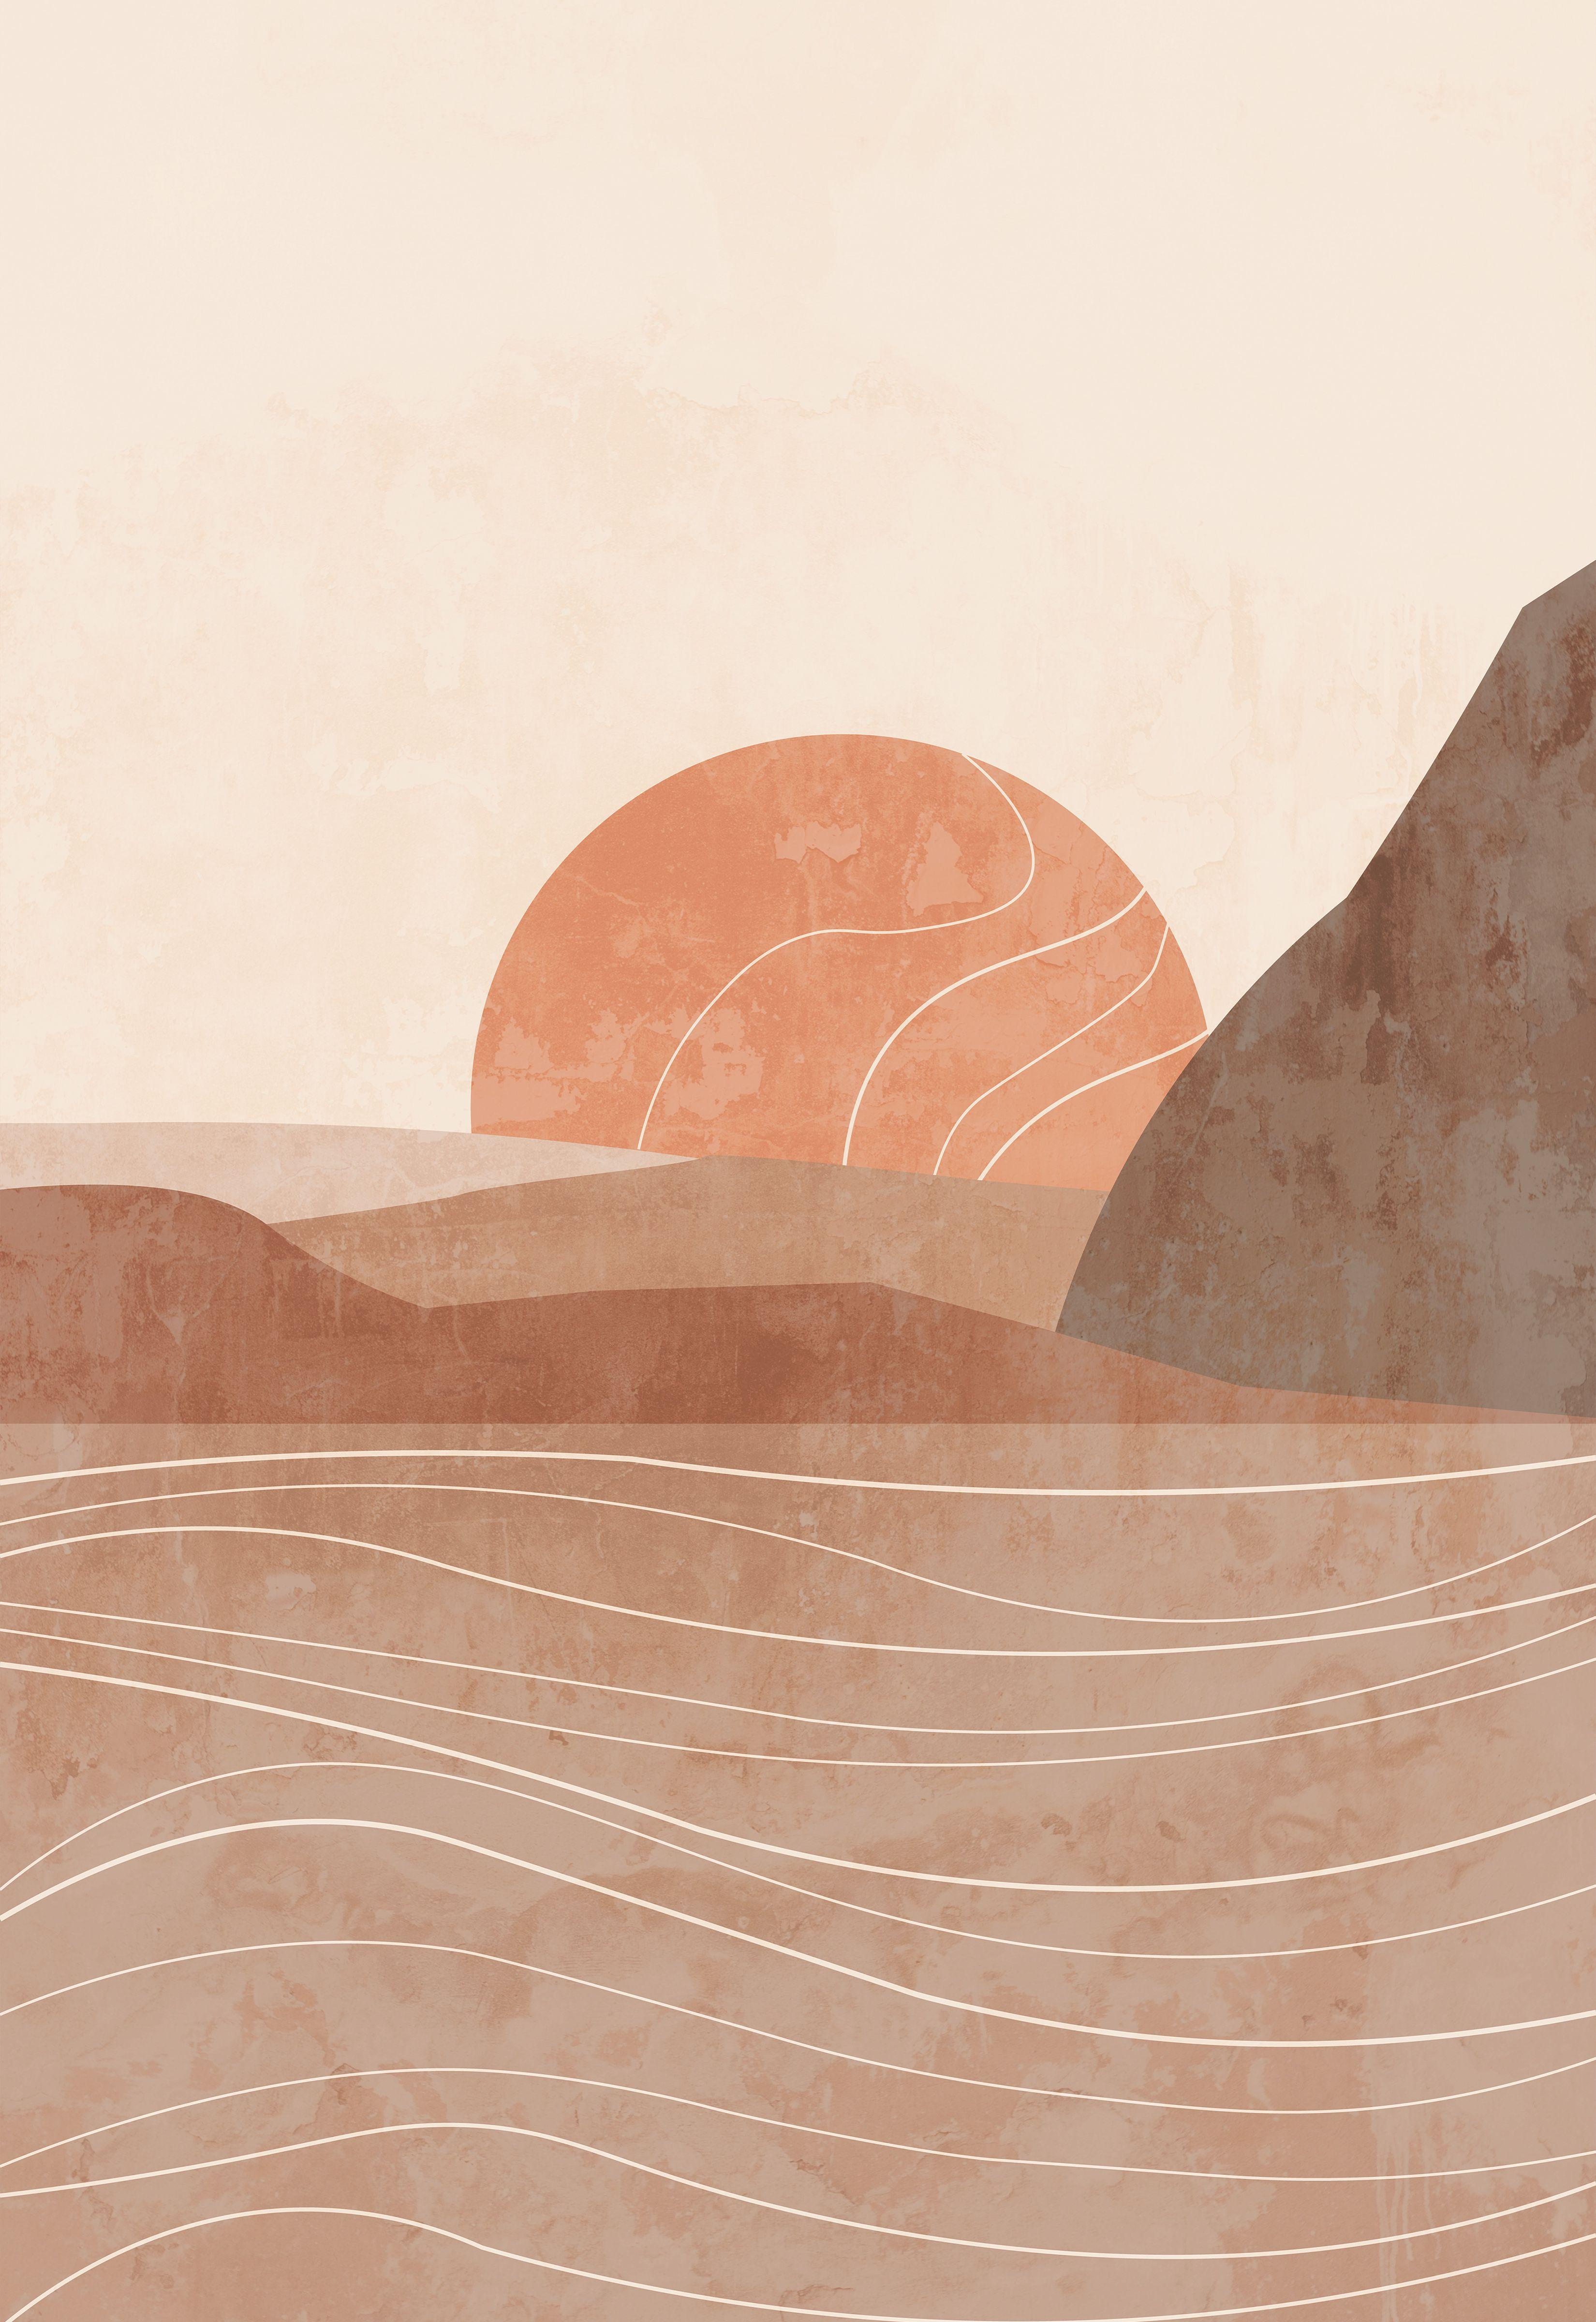 Abstract Boho Landscape Modern Art Terracotta Print In 2020 Art Prints Boho Modern Art Prints Wall Art Wallpaper